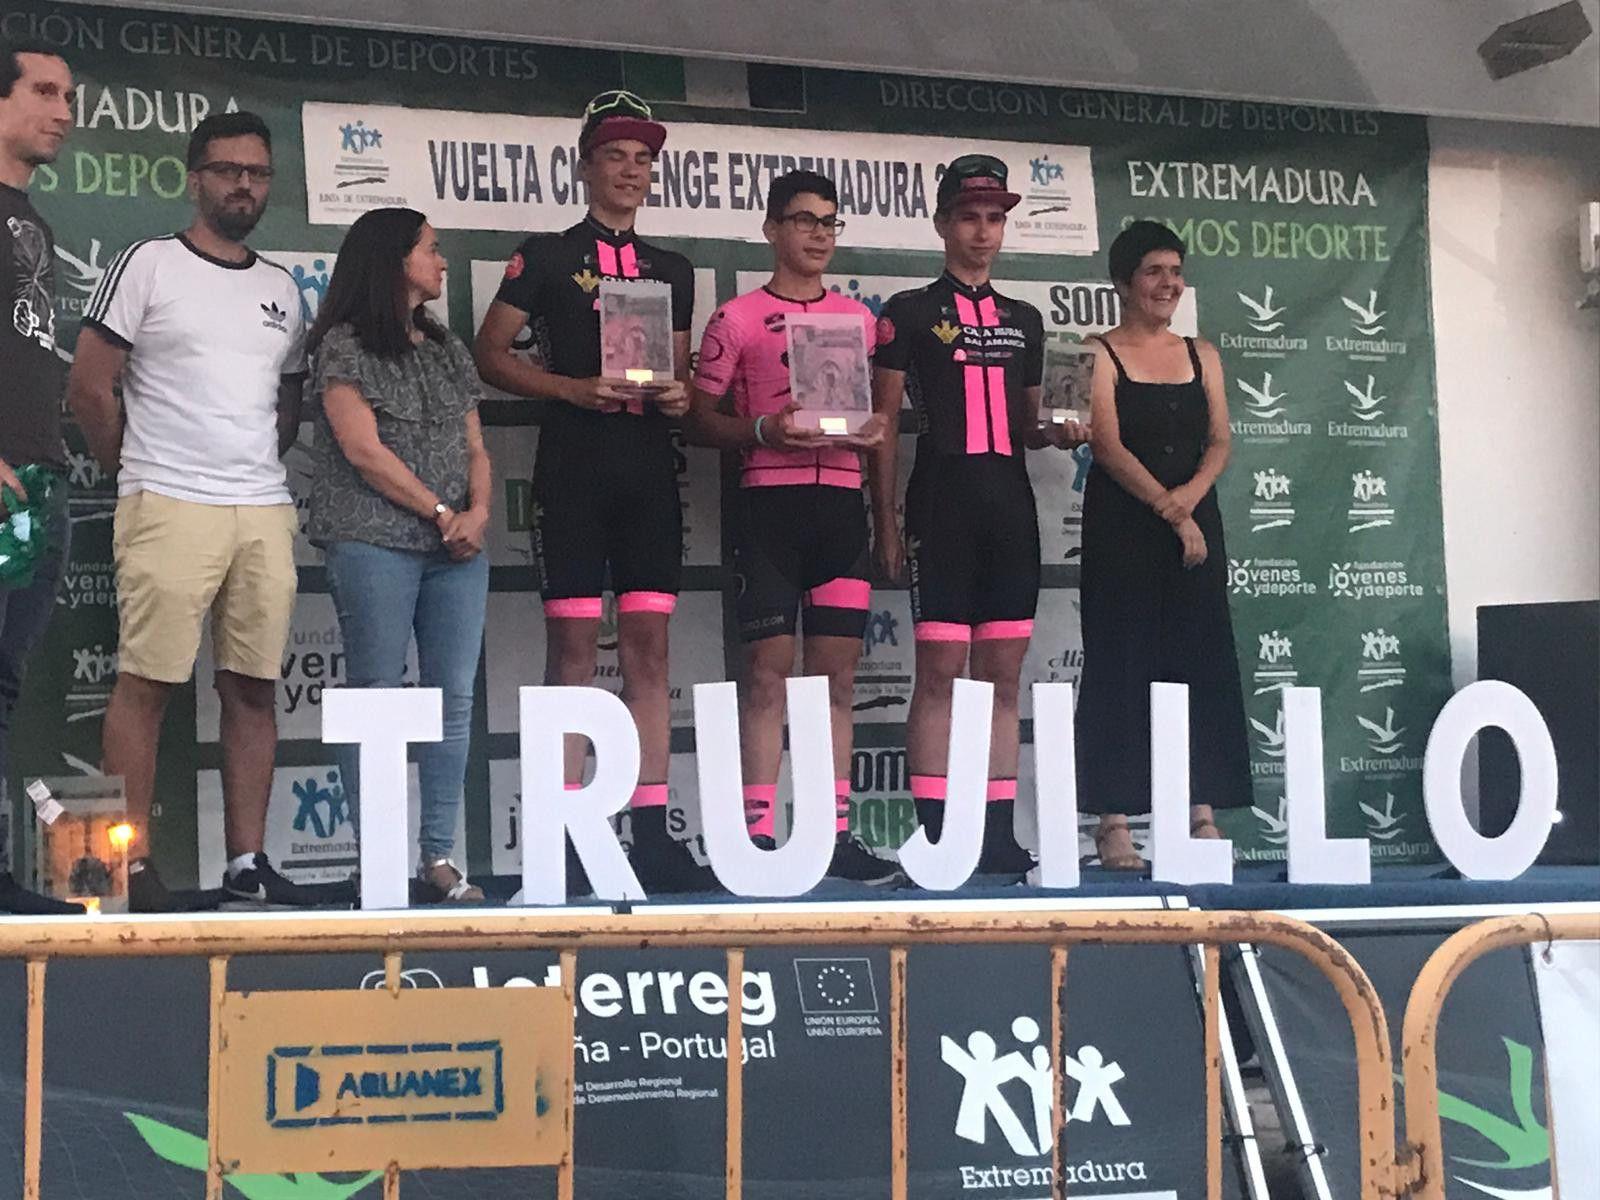 Podio Subida Castillo Trujillo, segundo Javier Martu00edn y tercero Juan Mari Cuella